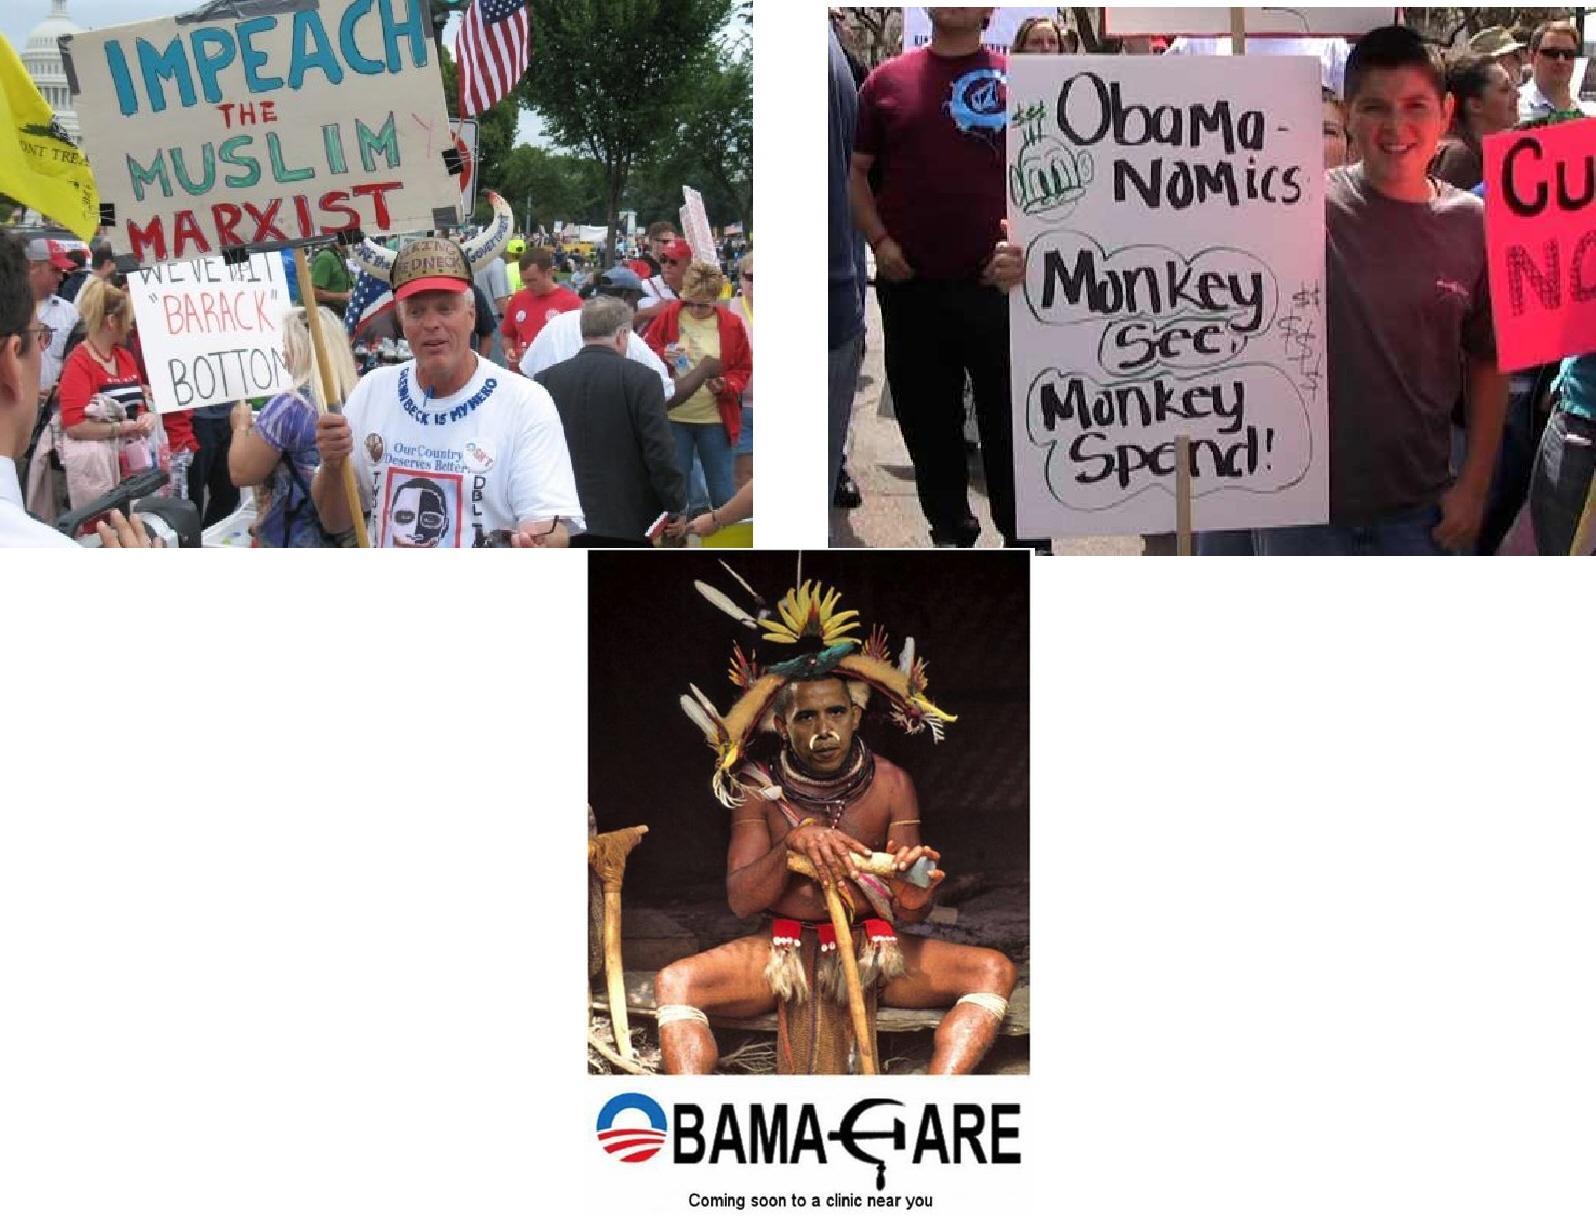 http://1.bp.blogspot.com/_mupm2BmIjtc/S8NxCZXumXI/AAAAAAAALfw/M5sg8SL2hA4/s1600/tea+party+racist+signs.jpg